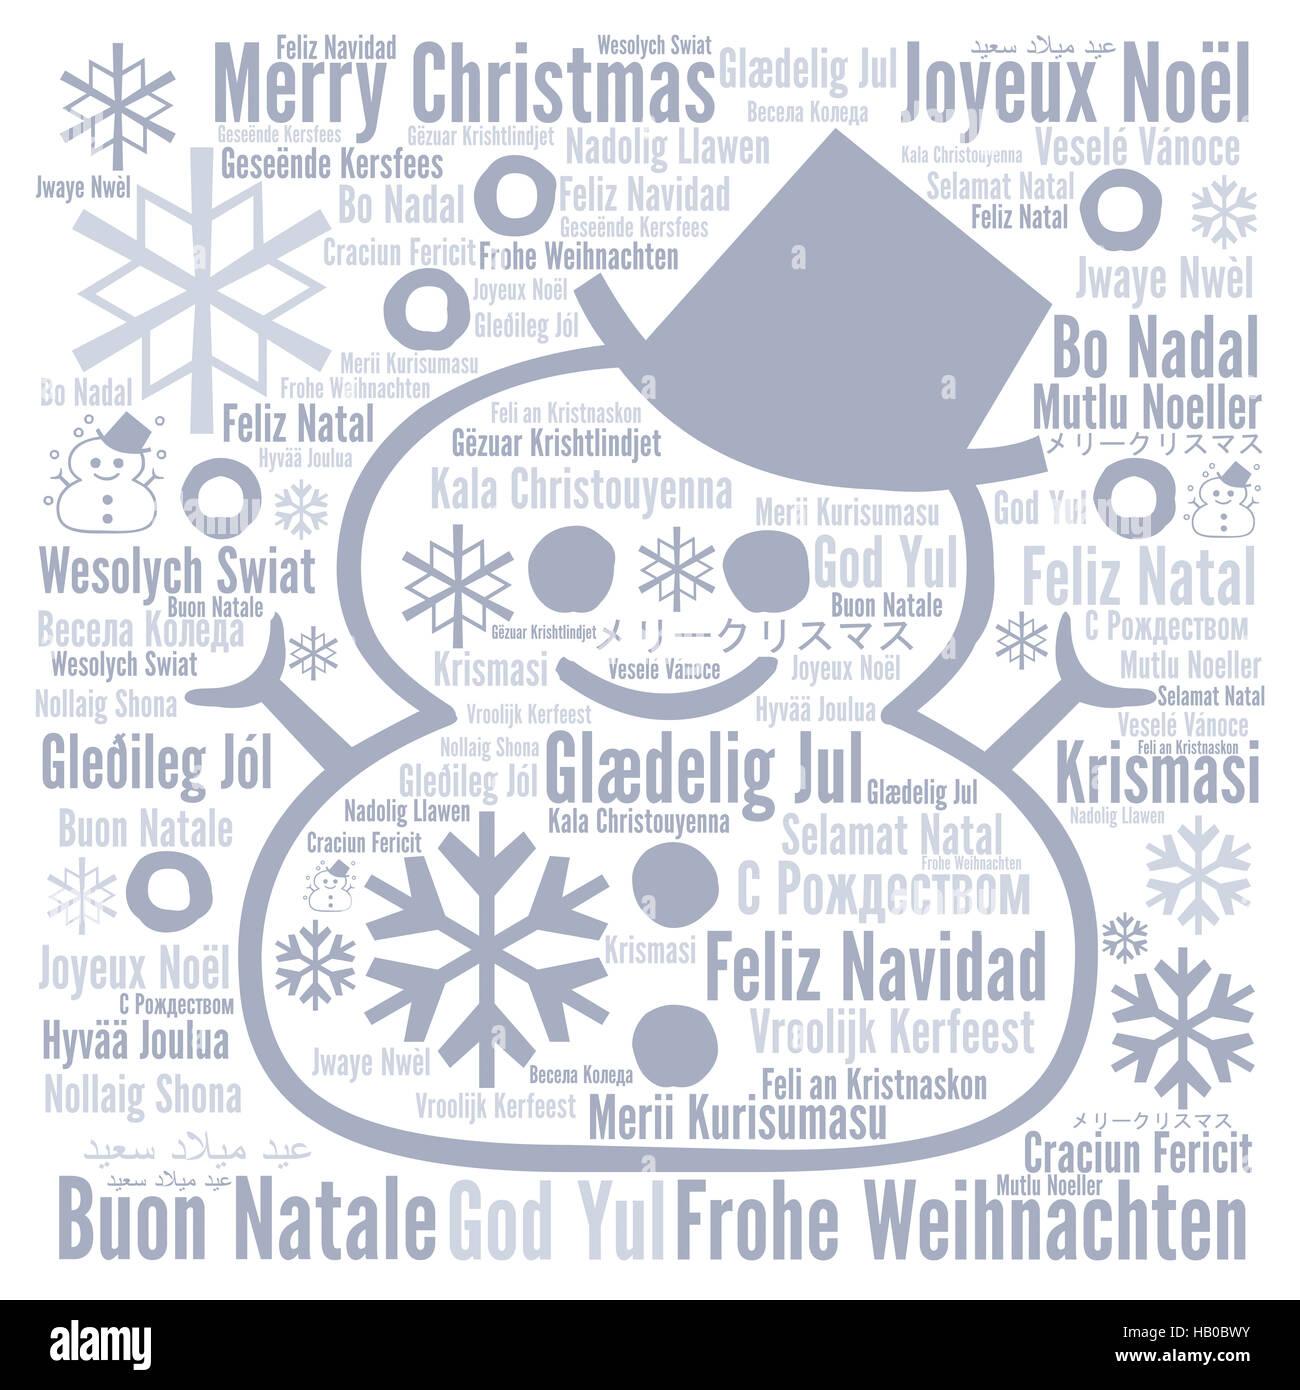 Merry Christmas In German Stock Photos & Merry Christmas In German ...